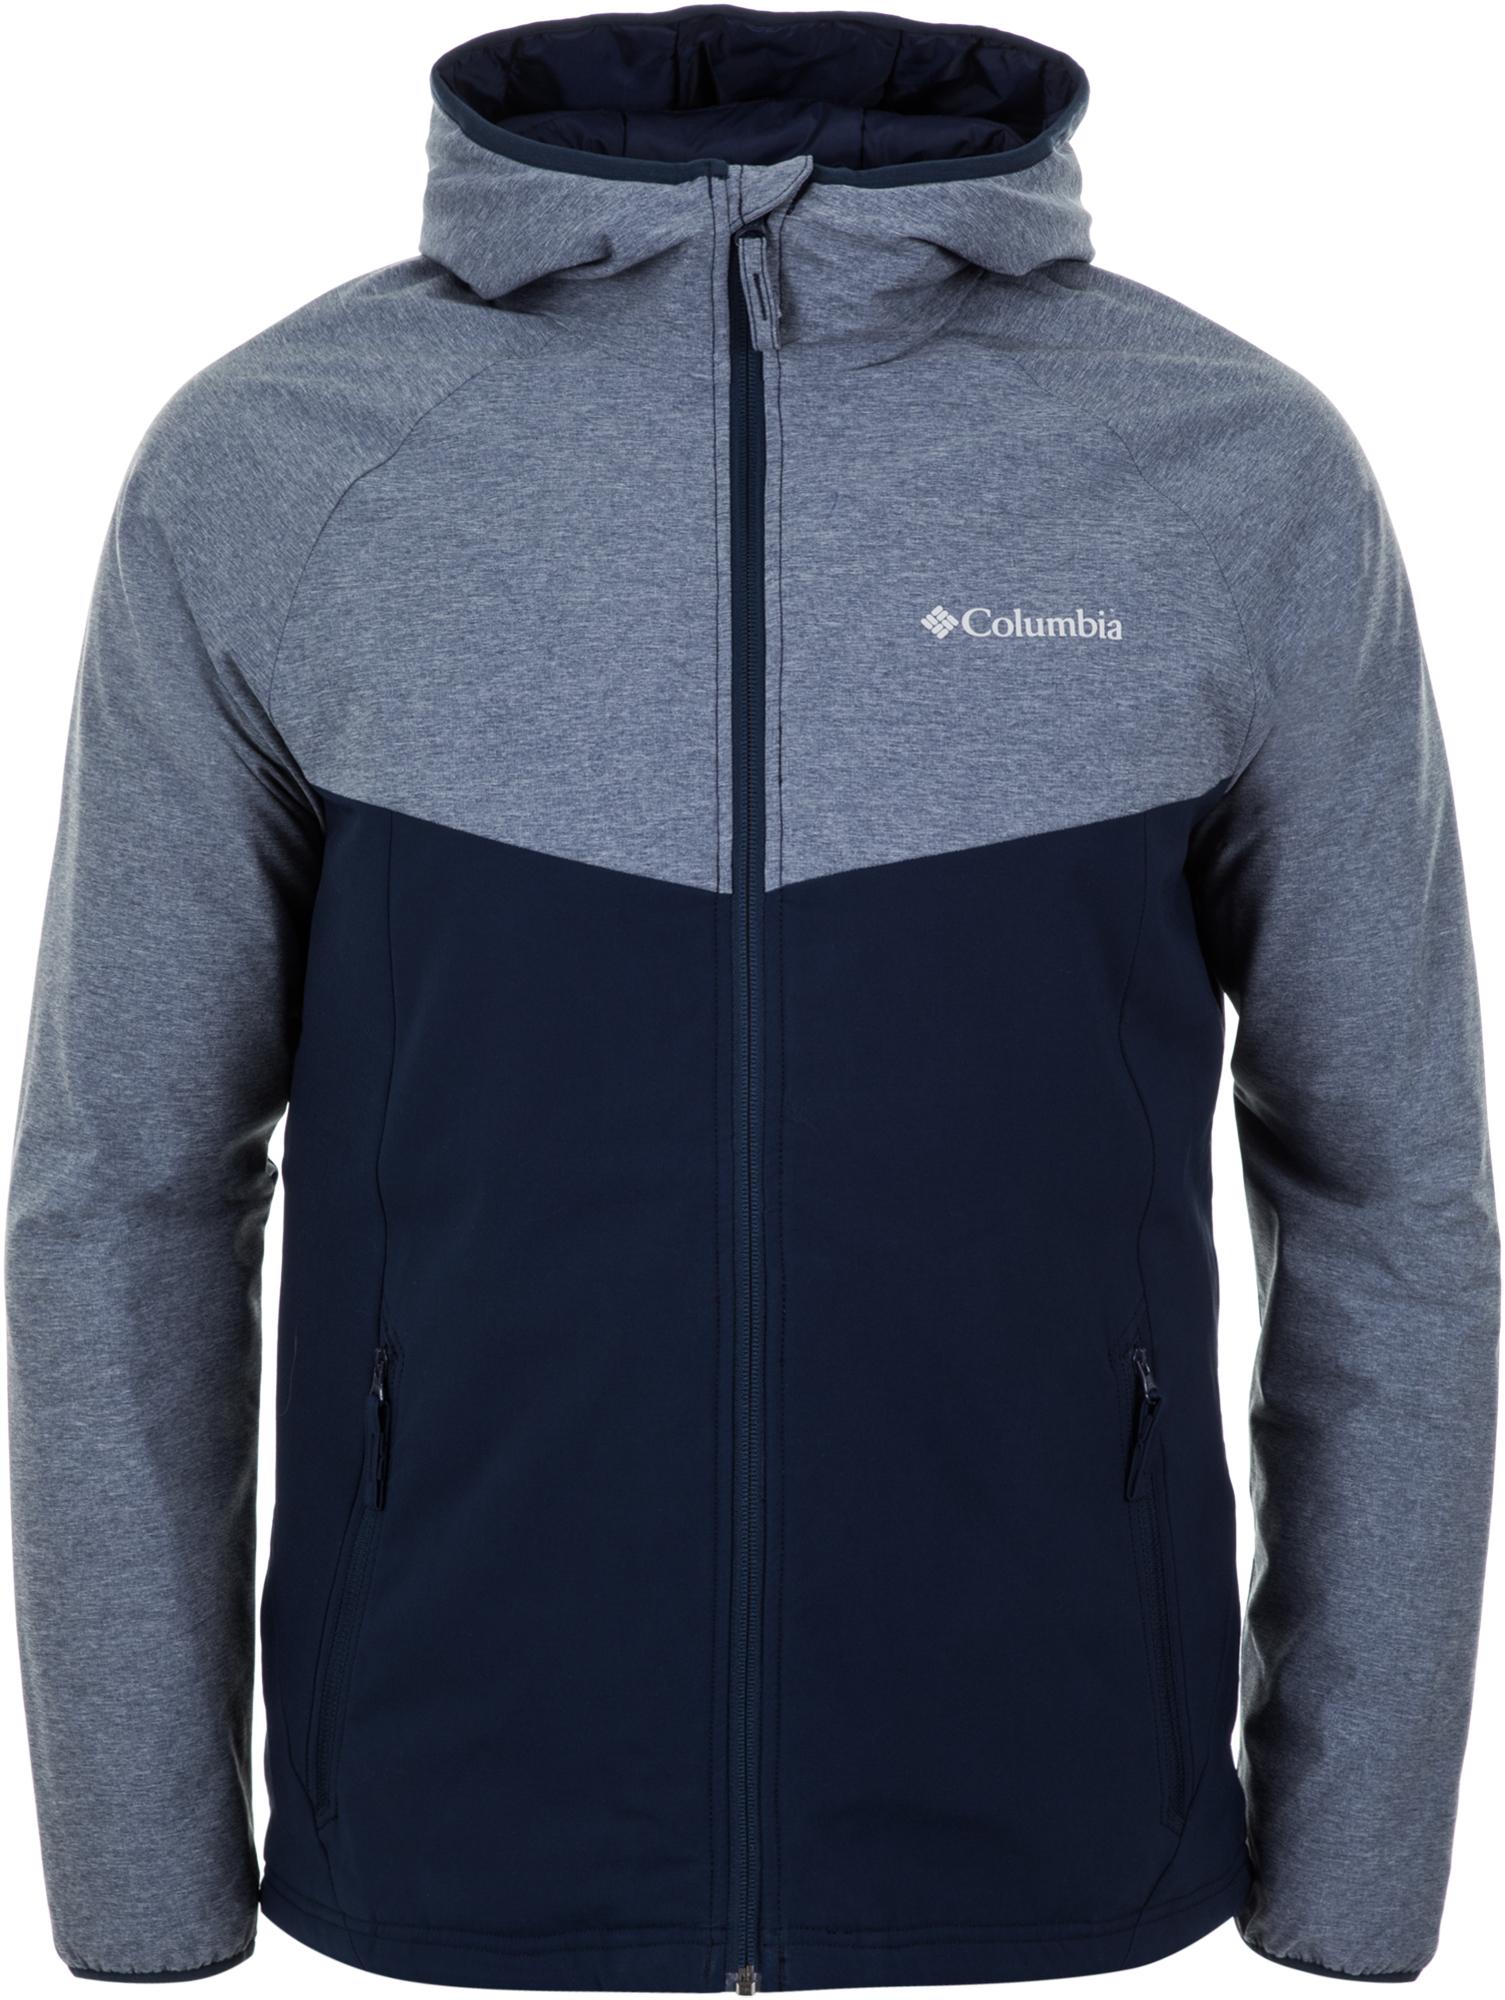 Columbia Куртка утепленная мужская Columbia Heather Canyon II, размер 56-58 цена